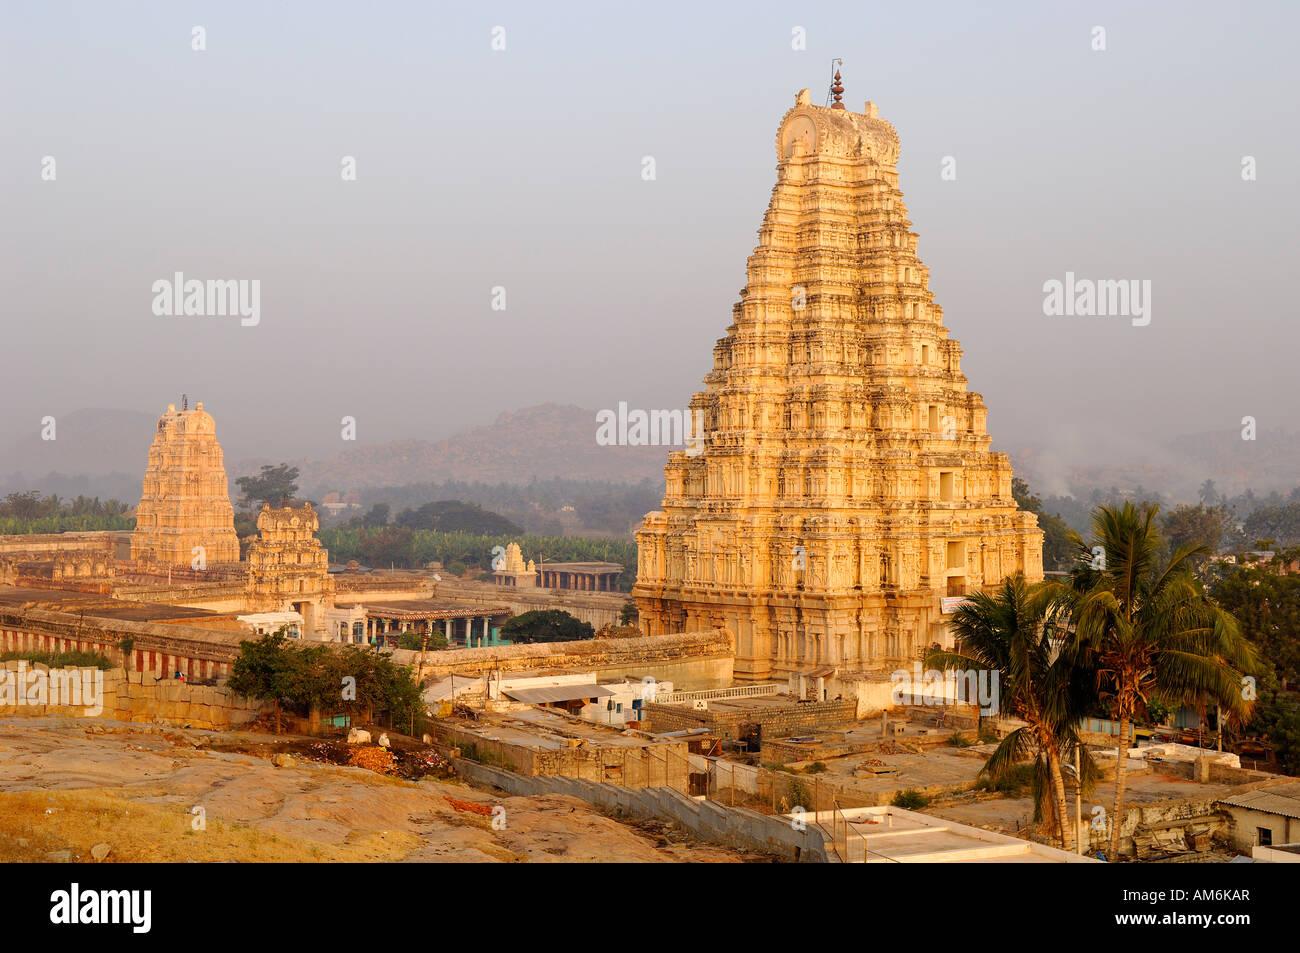 India, Karnataka, Hampi, Virupaksha Temple, one of the